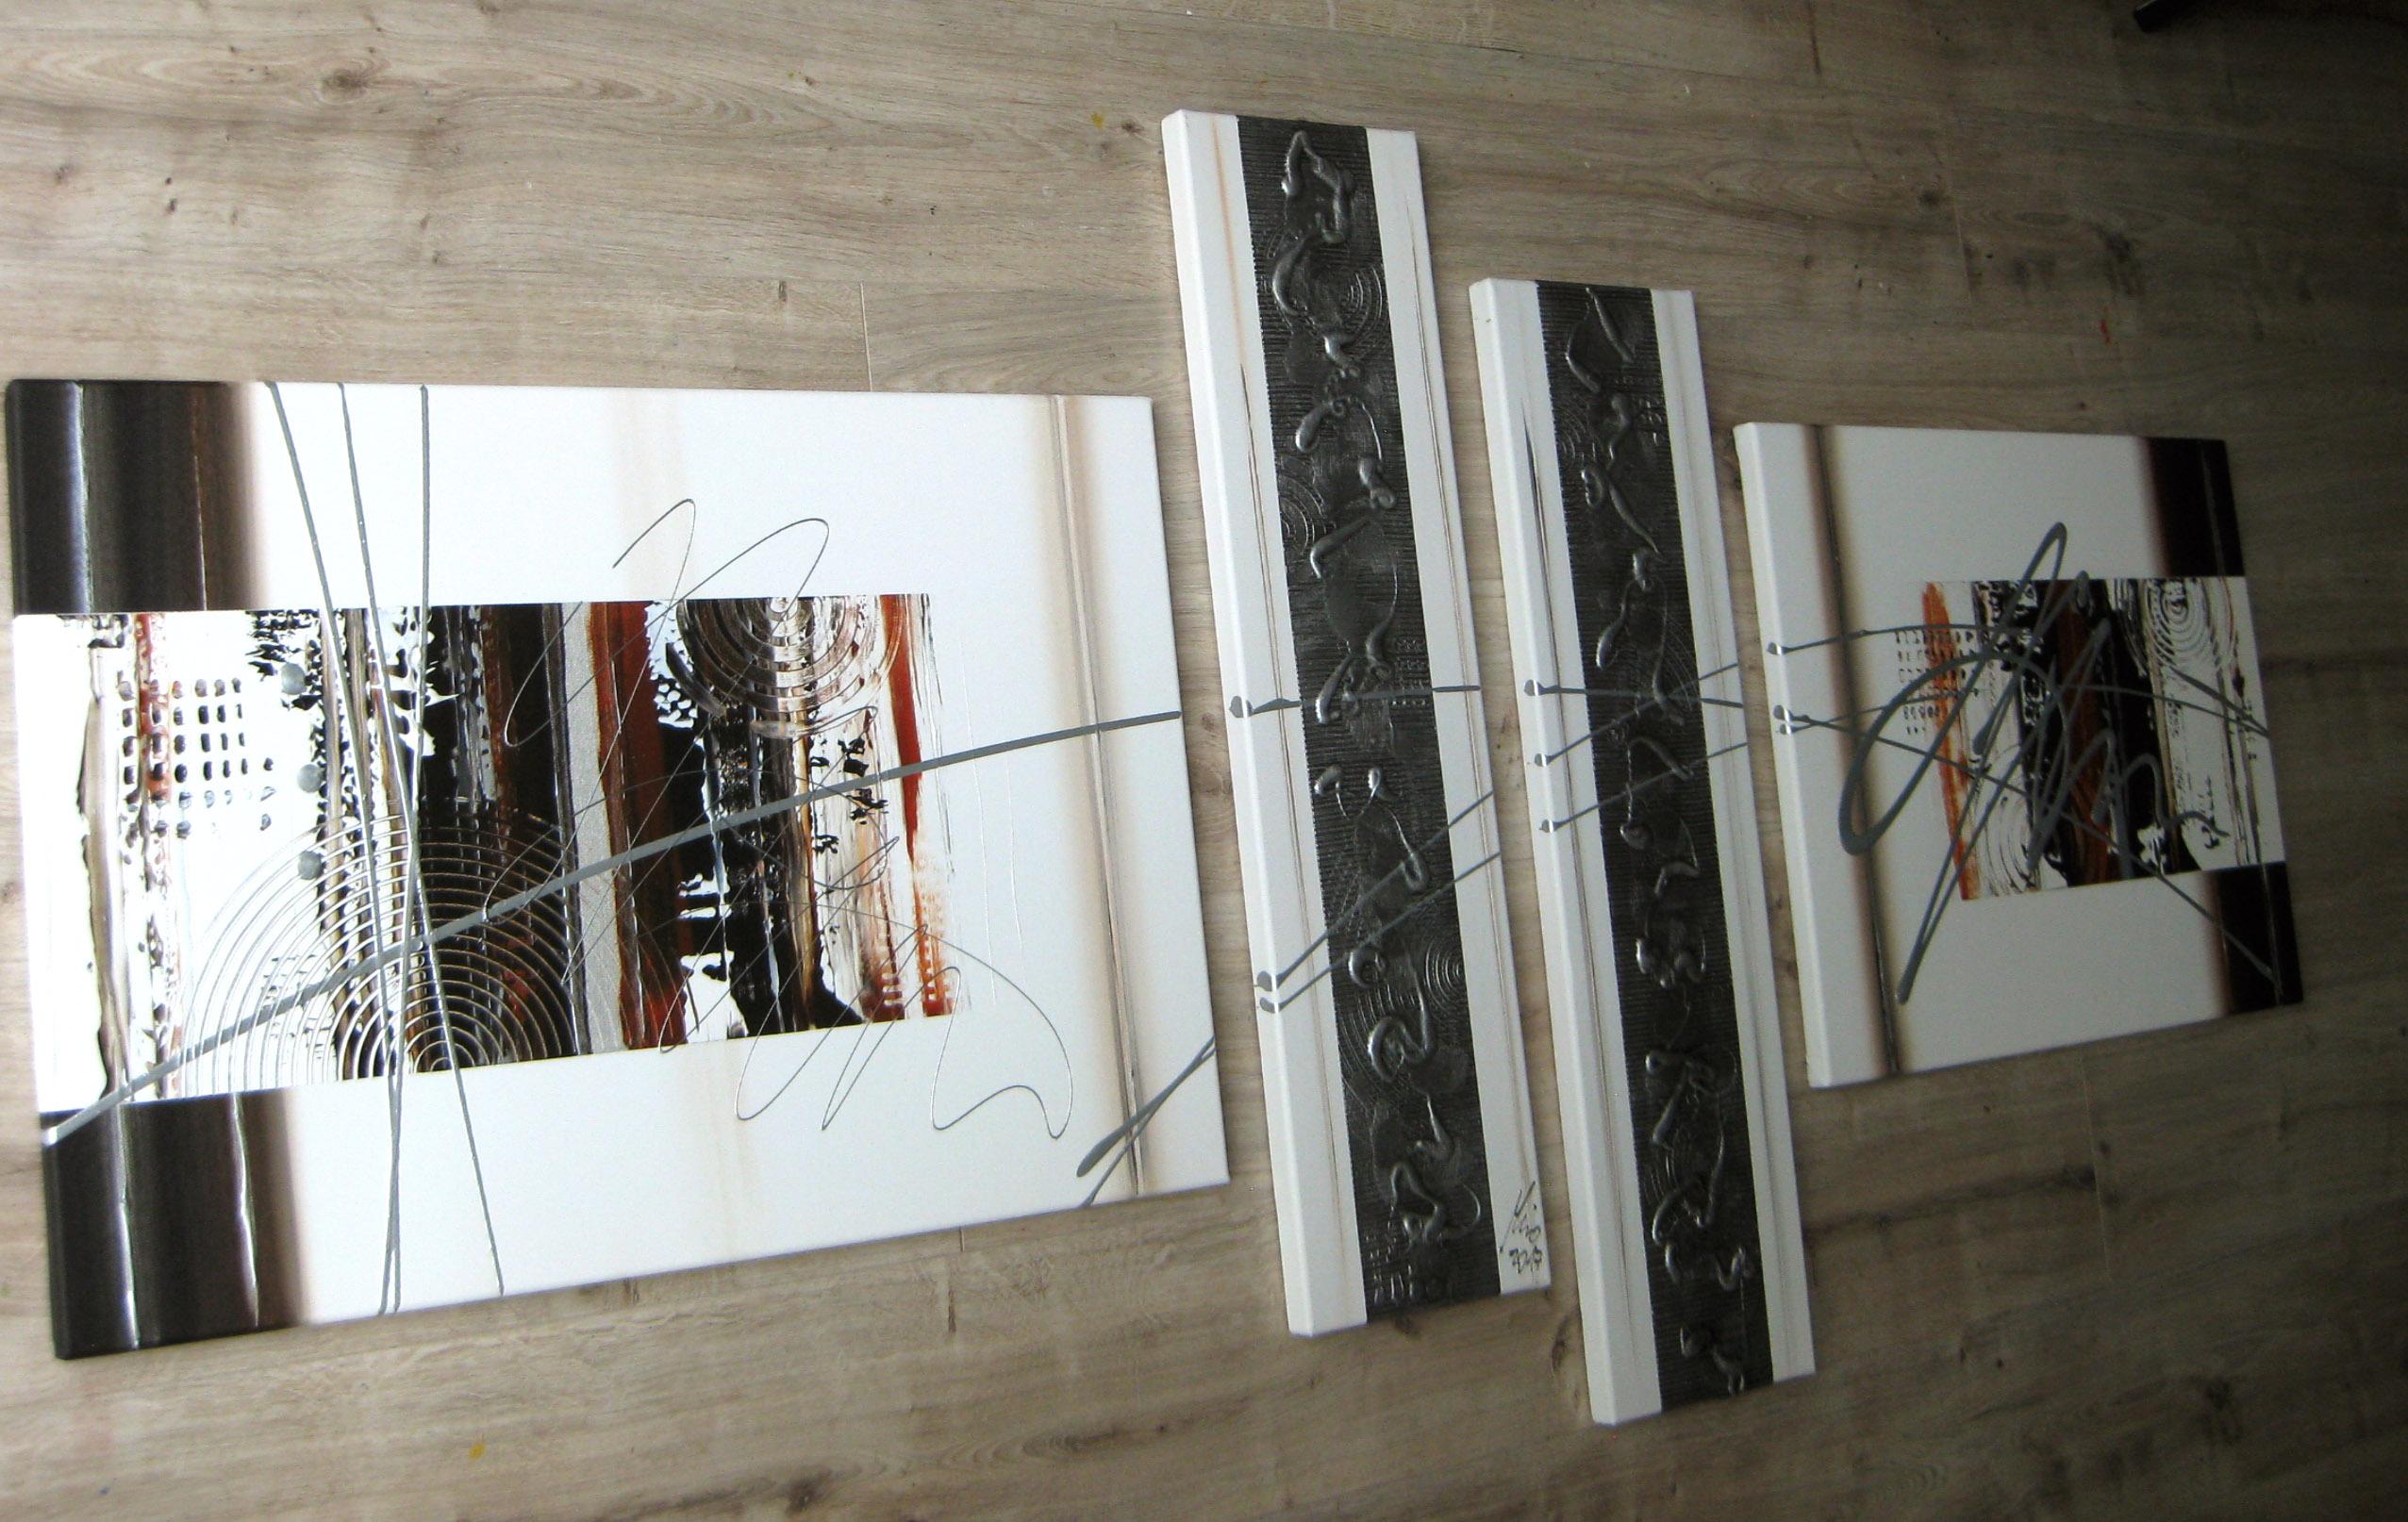 kunst bilder kaufen pd25 takasytuacja. Black Bedroom Furniture Sets. Home Design Ideas